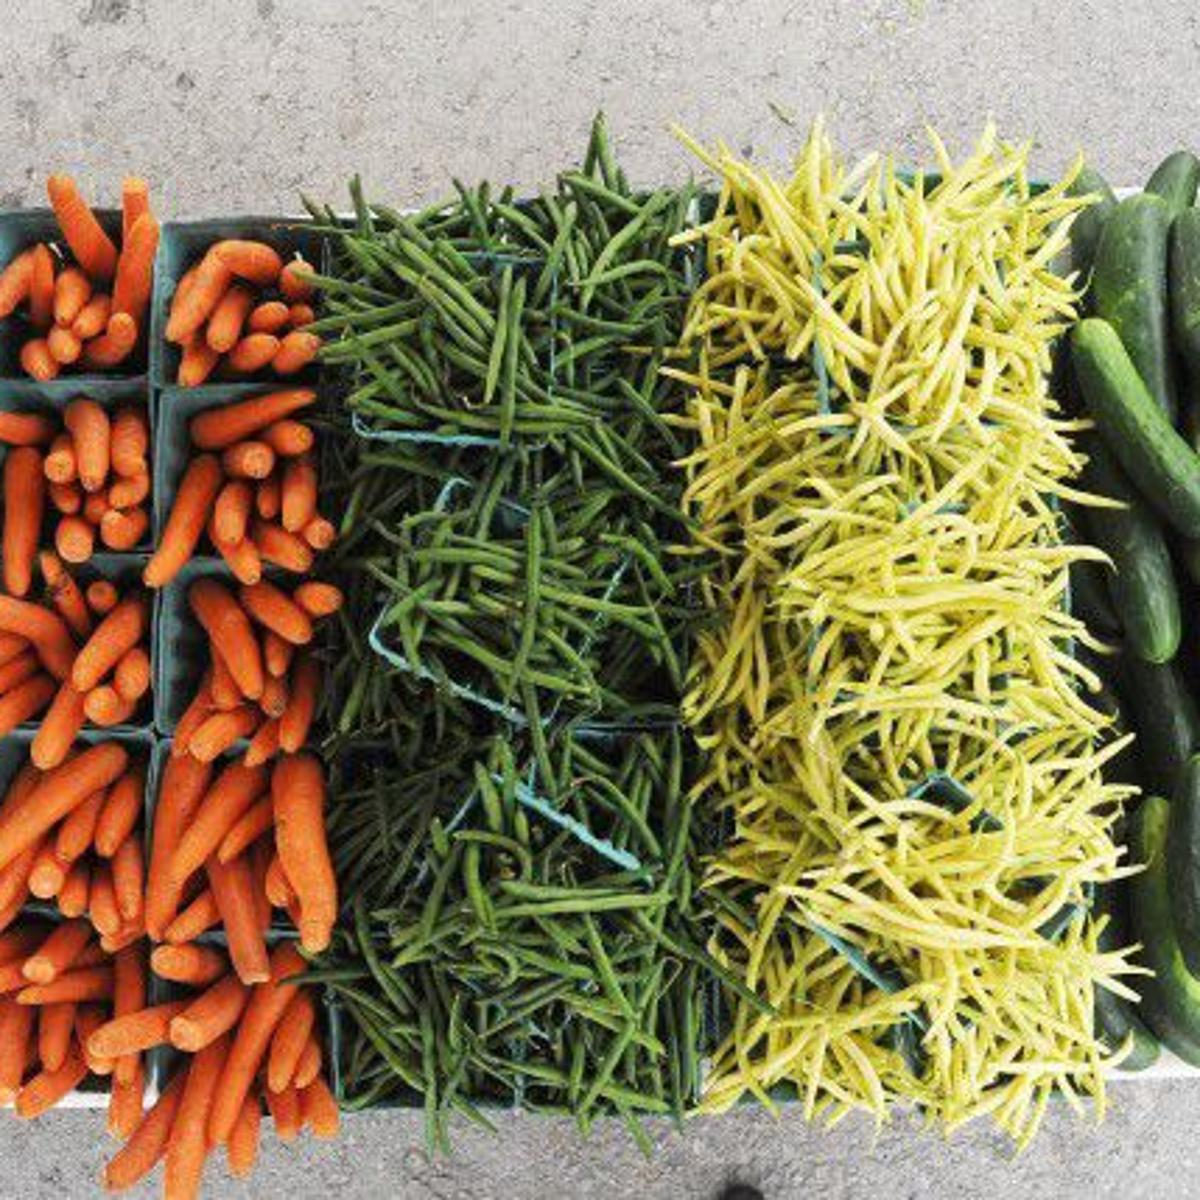 Cosentino: Browsing the Auburn Farmers Market   Lake Life